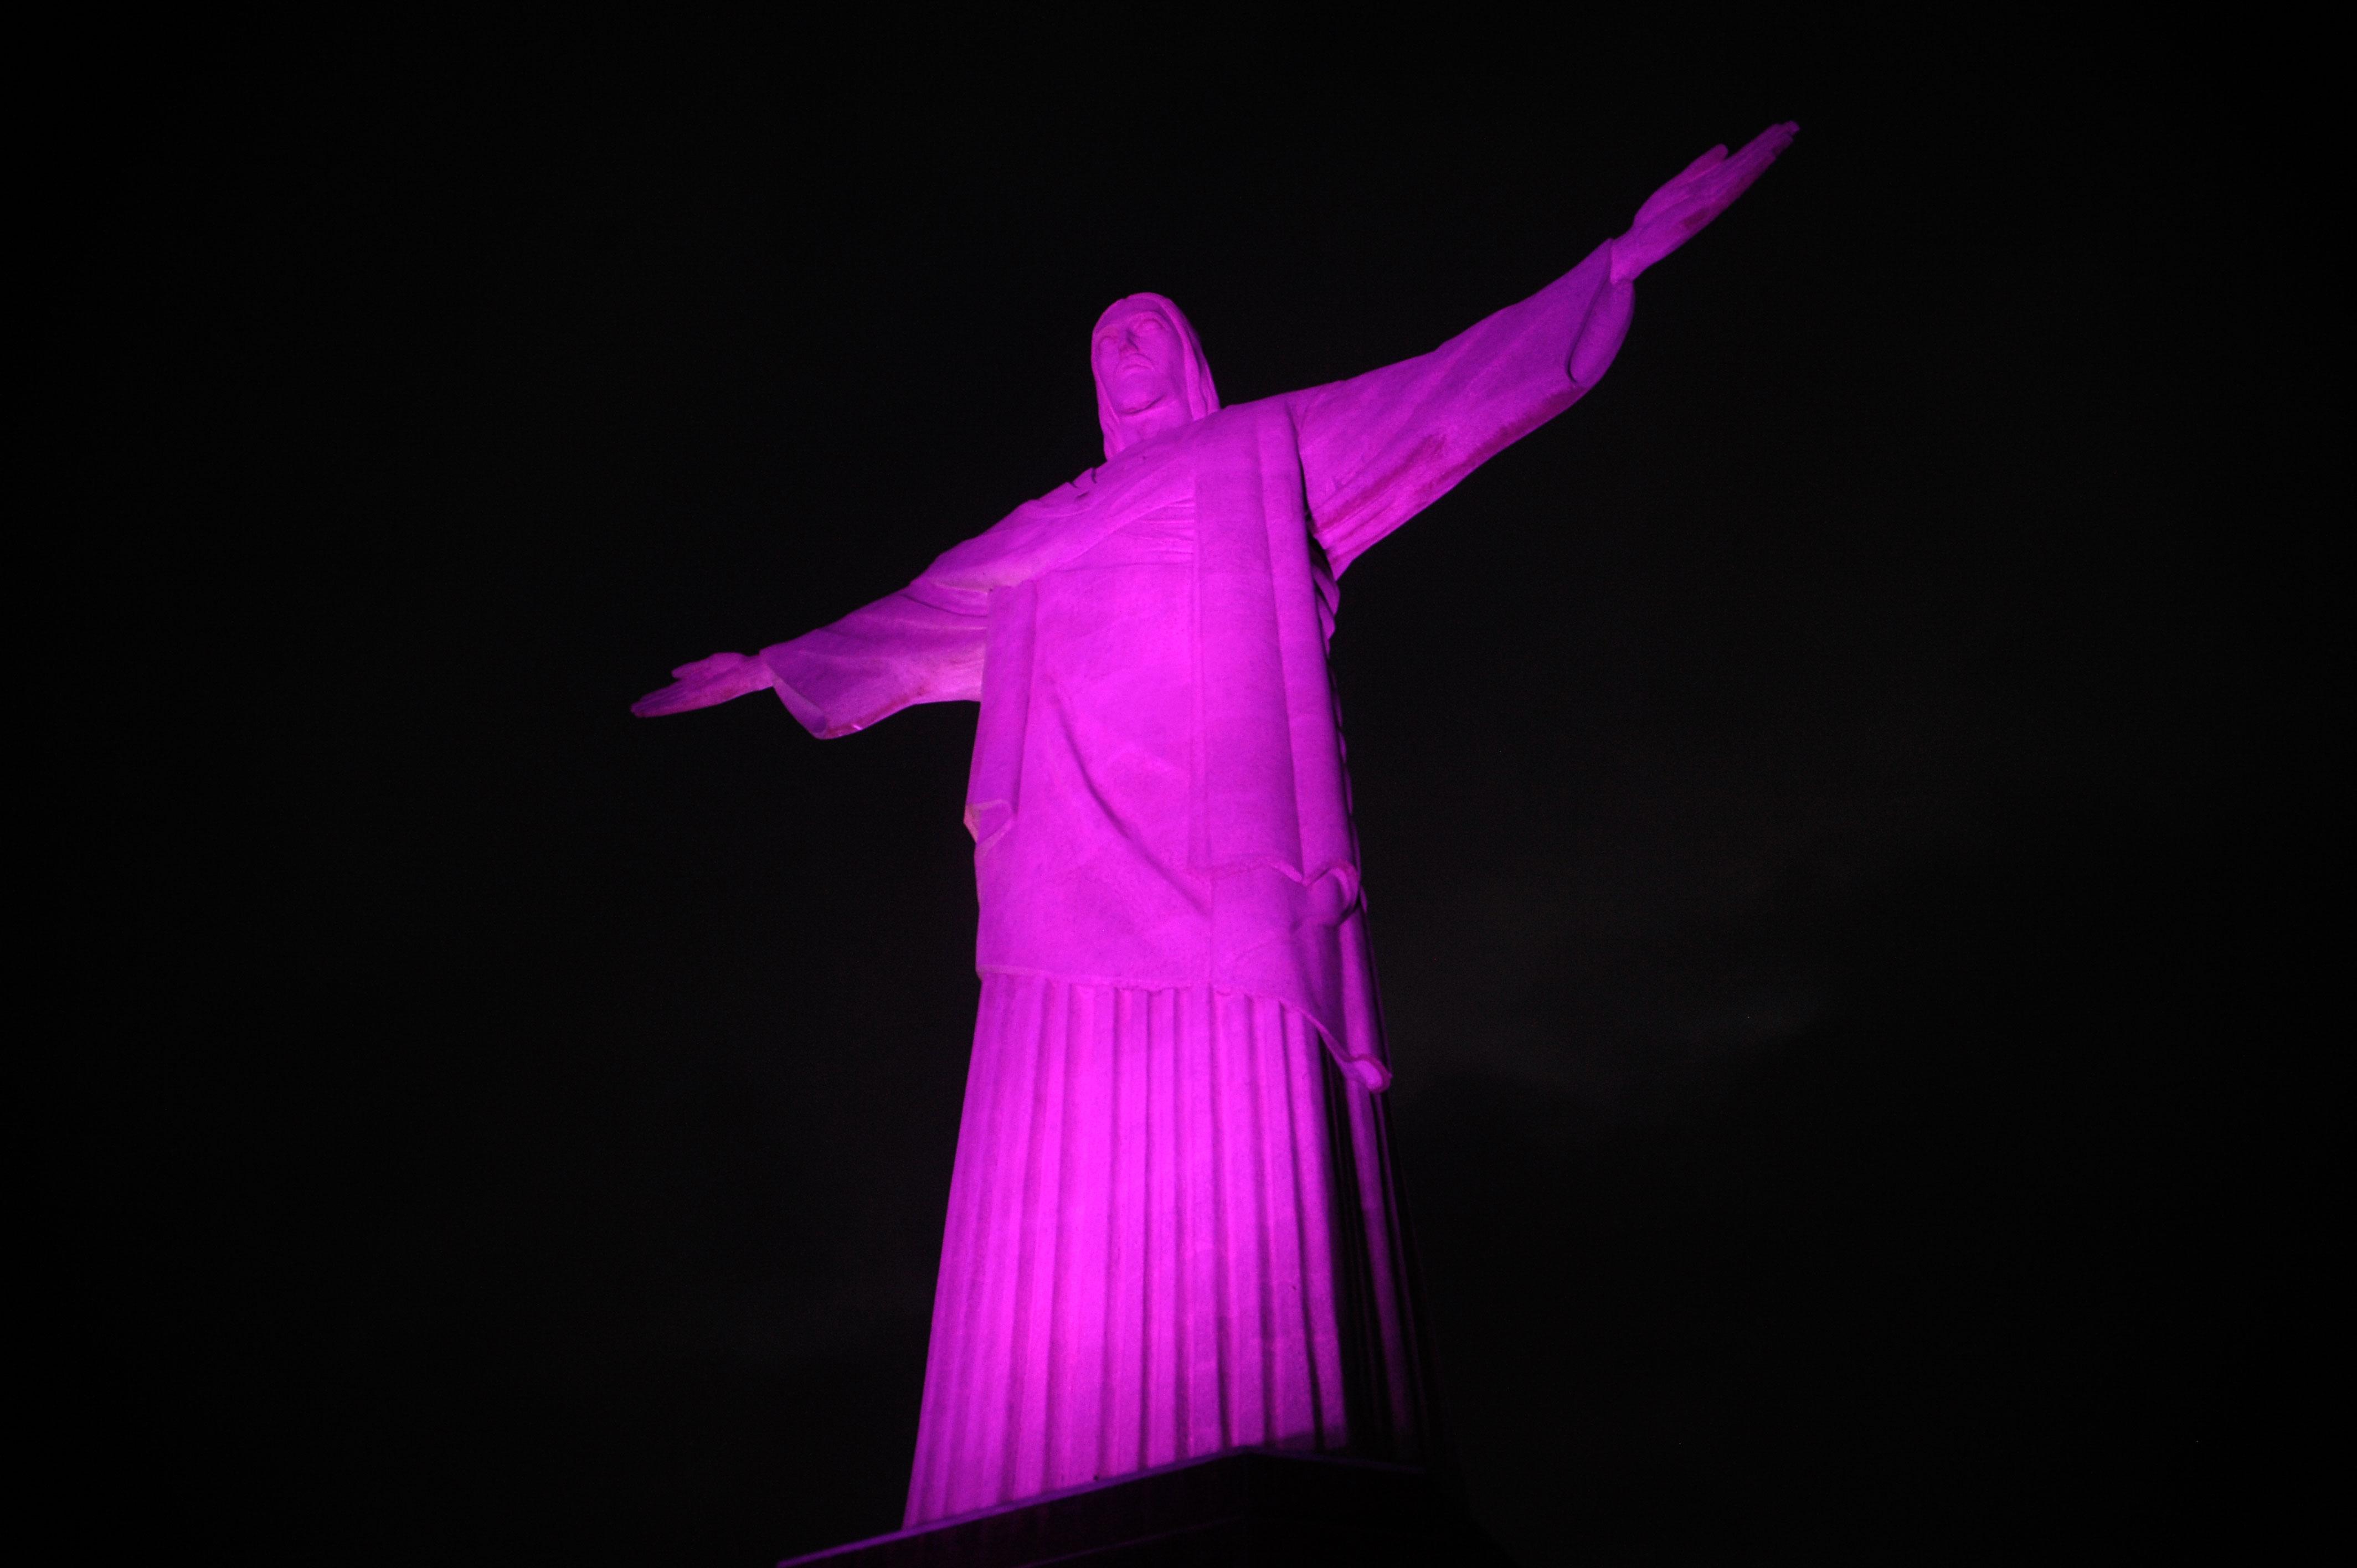 Cristo Redentor no Rio de Janeiro iluminado de rosa por campanha do Outubro Rosa